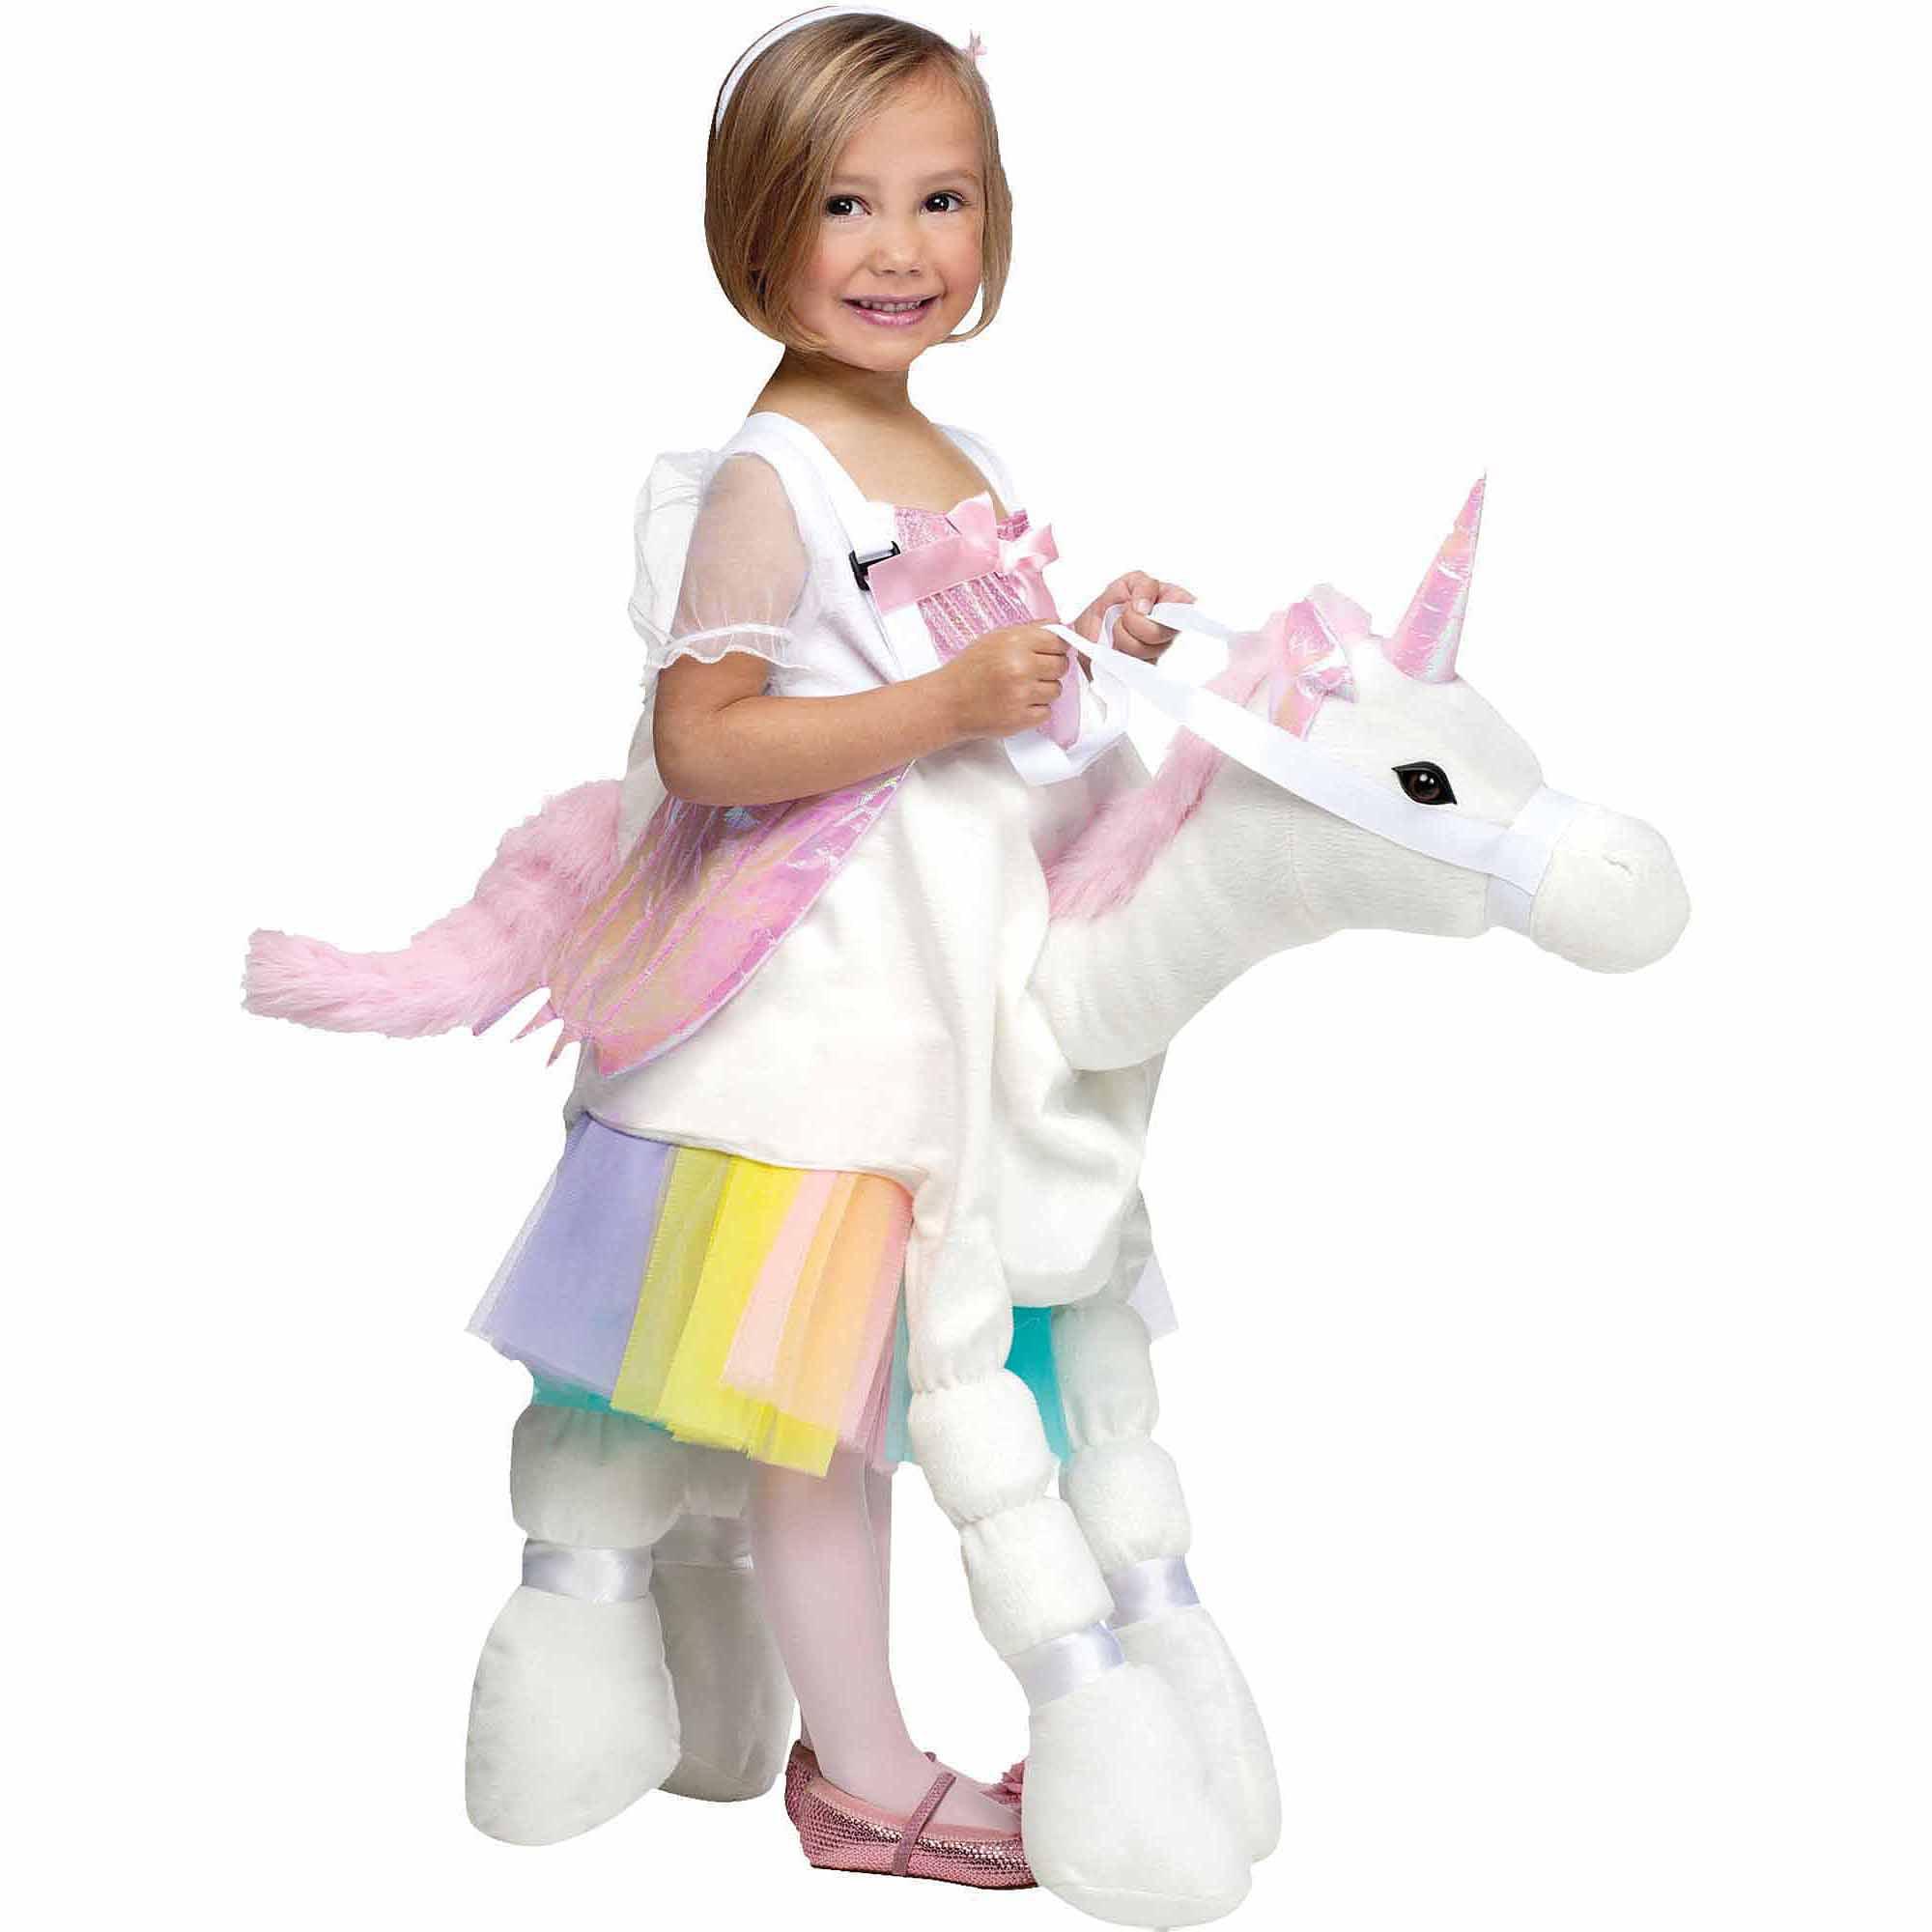 Ride-A-Unicorn Child Halloween Costume